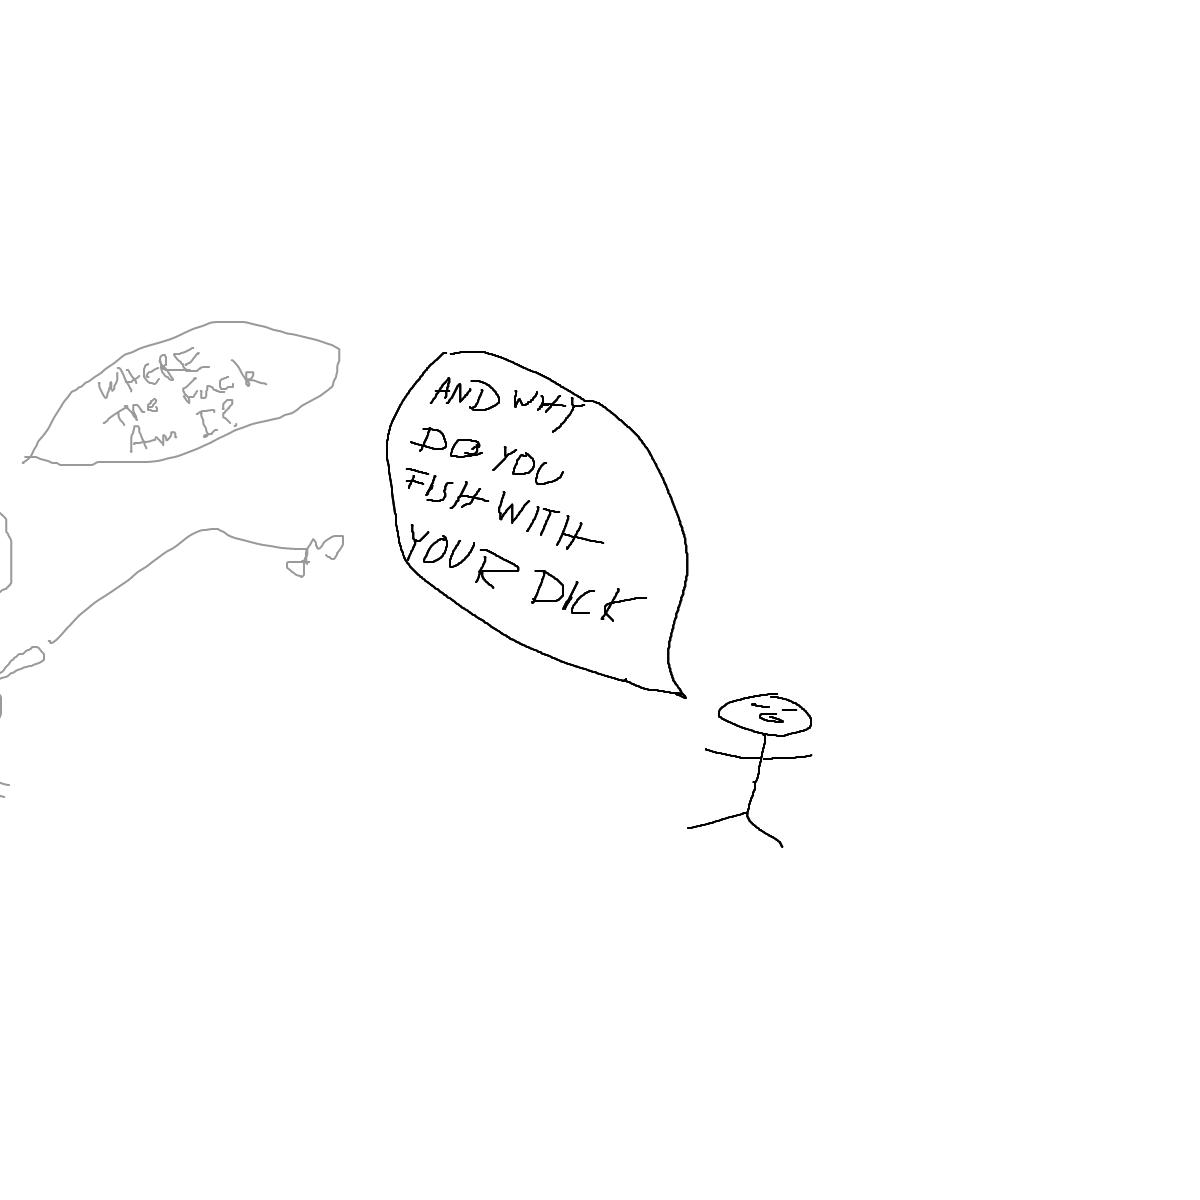 BAAAM drawing#335 lat:-49.3449211120605500lng: 69.3469314575195300